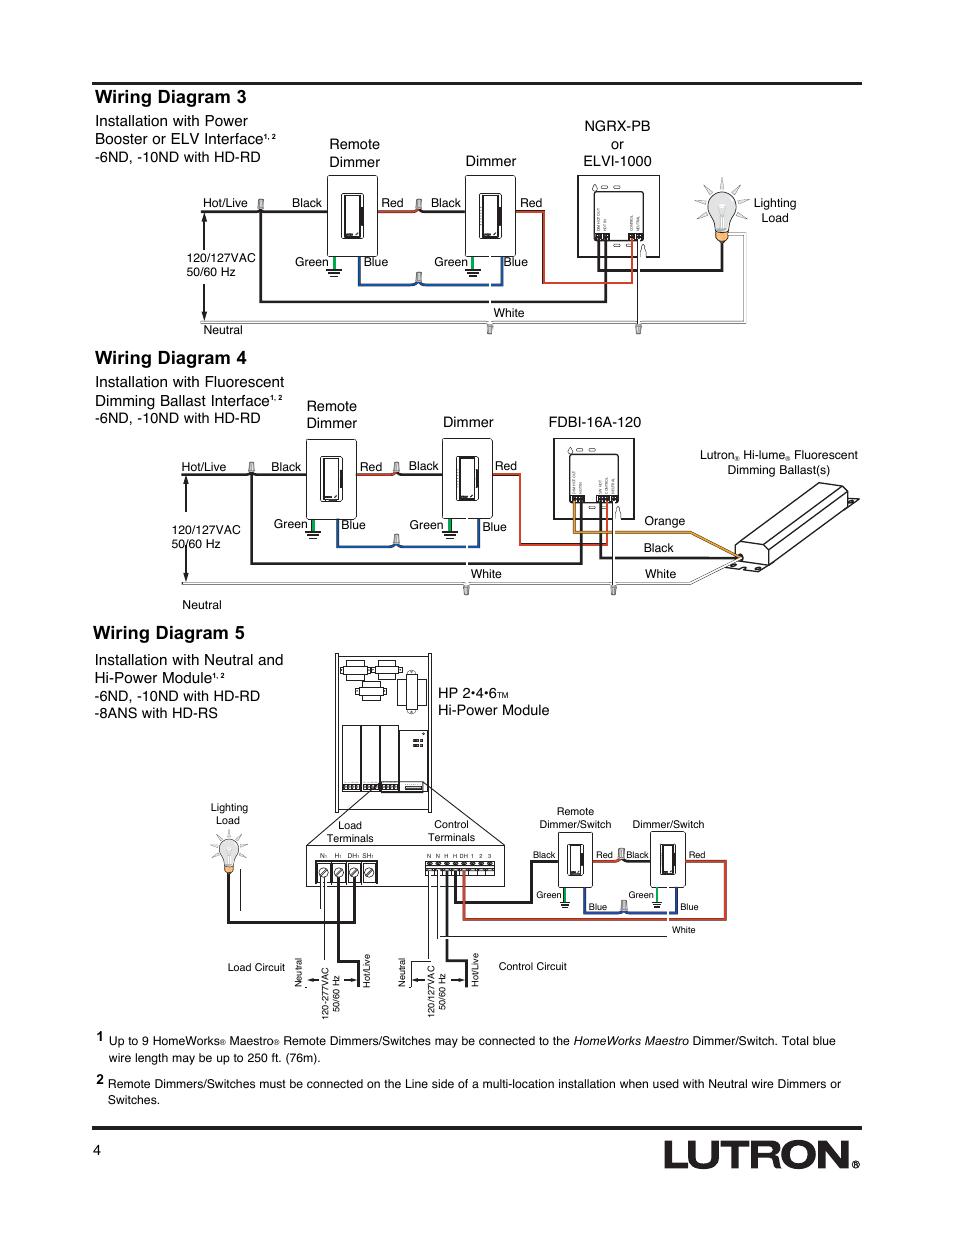 medium resolution of wiring diagram 3 wiring diagram 4 wiring diagram 5 lutron hd rswiring diagram 3